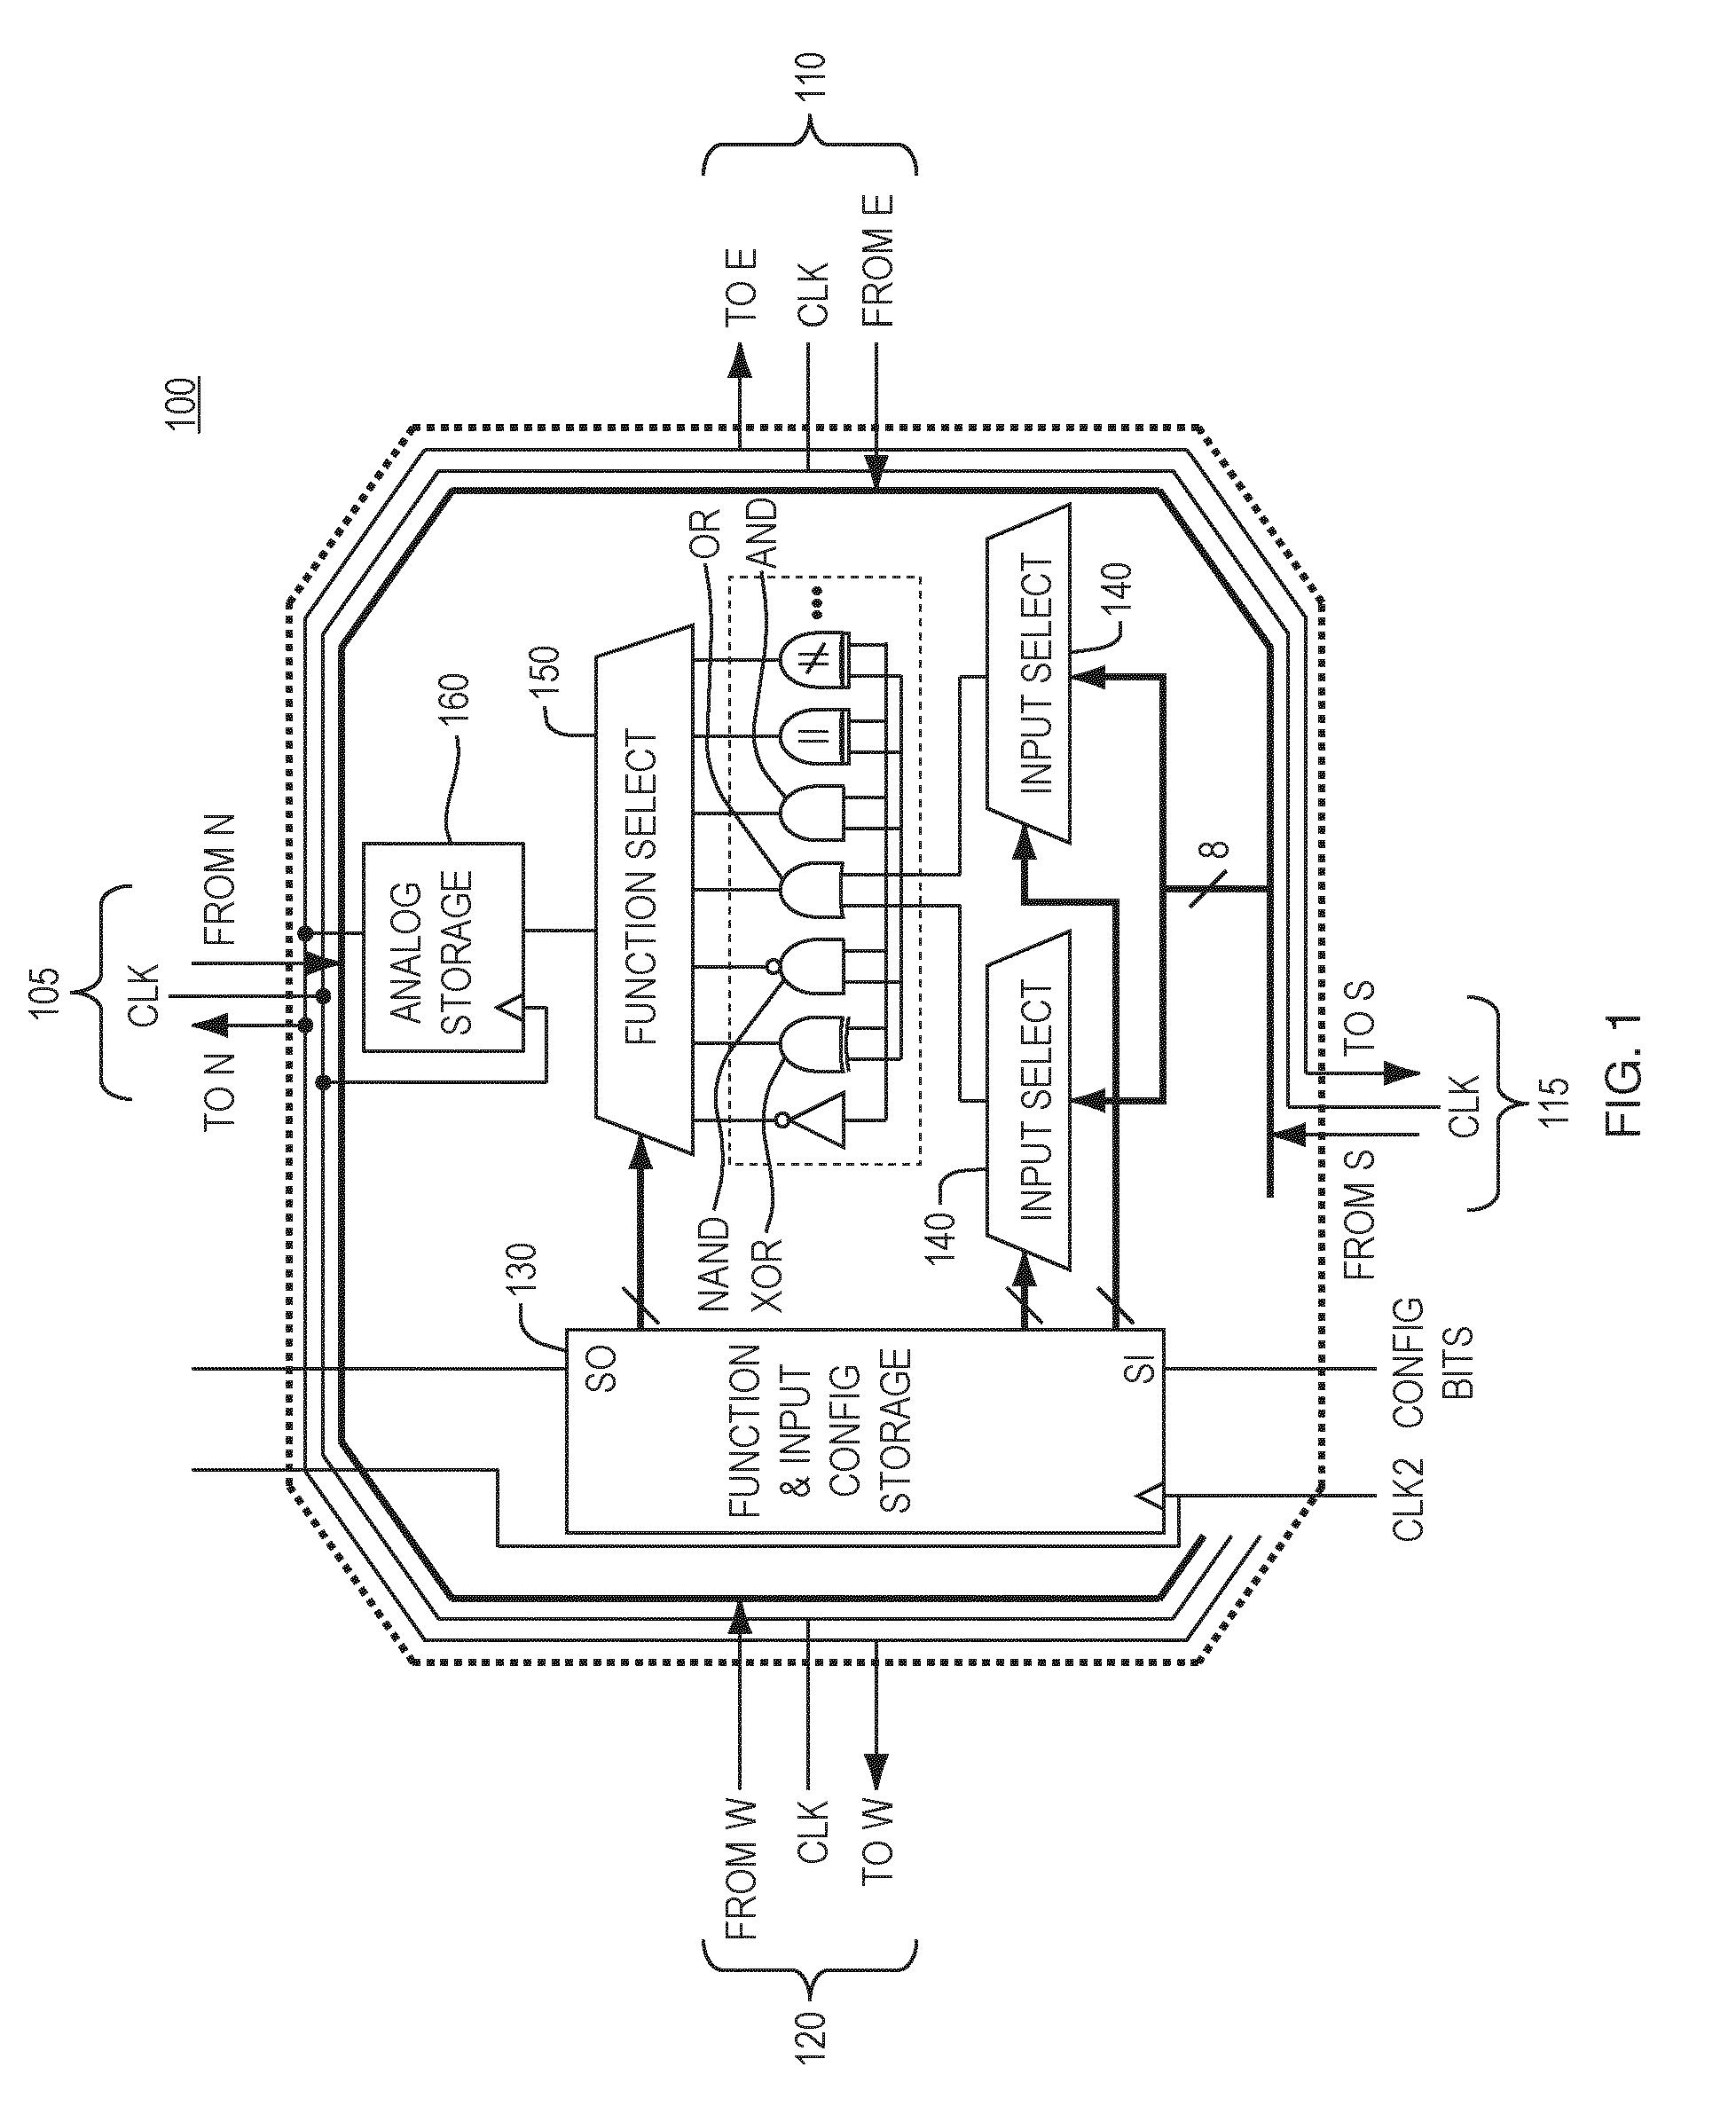 Patent us8350614 analog logic automata google patents patent drawing ccuart Images